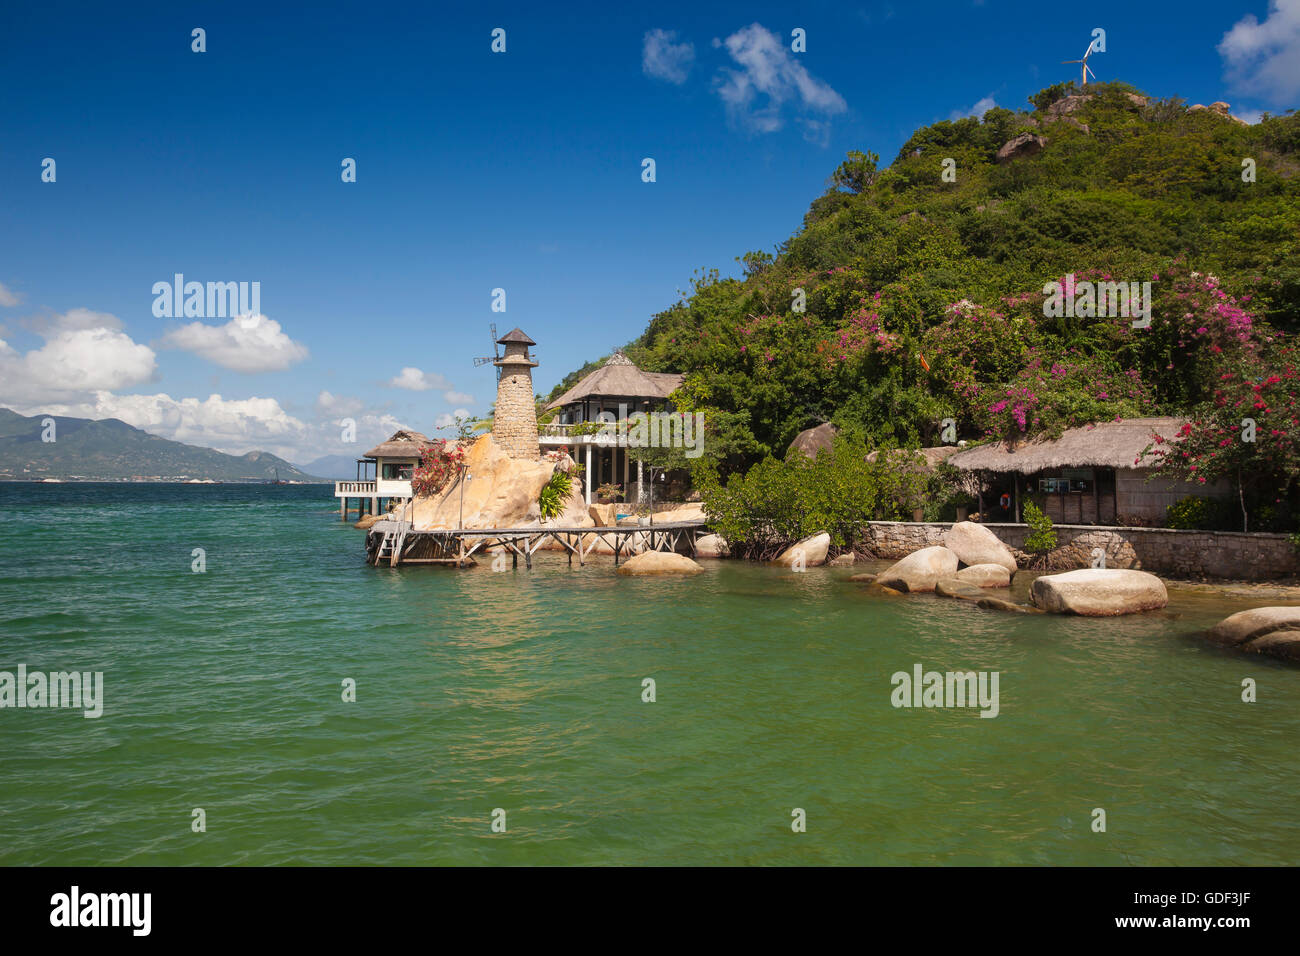 Small bungalow resort Ngoc Suong, in Cam Ranh Bay, Nha Trang, Vietnam Stock Photo